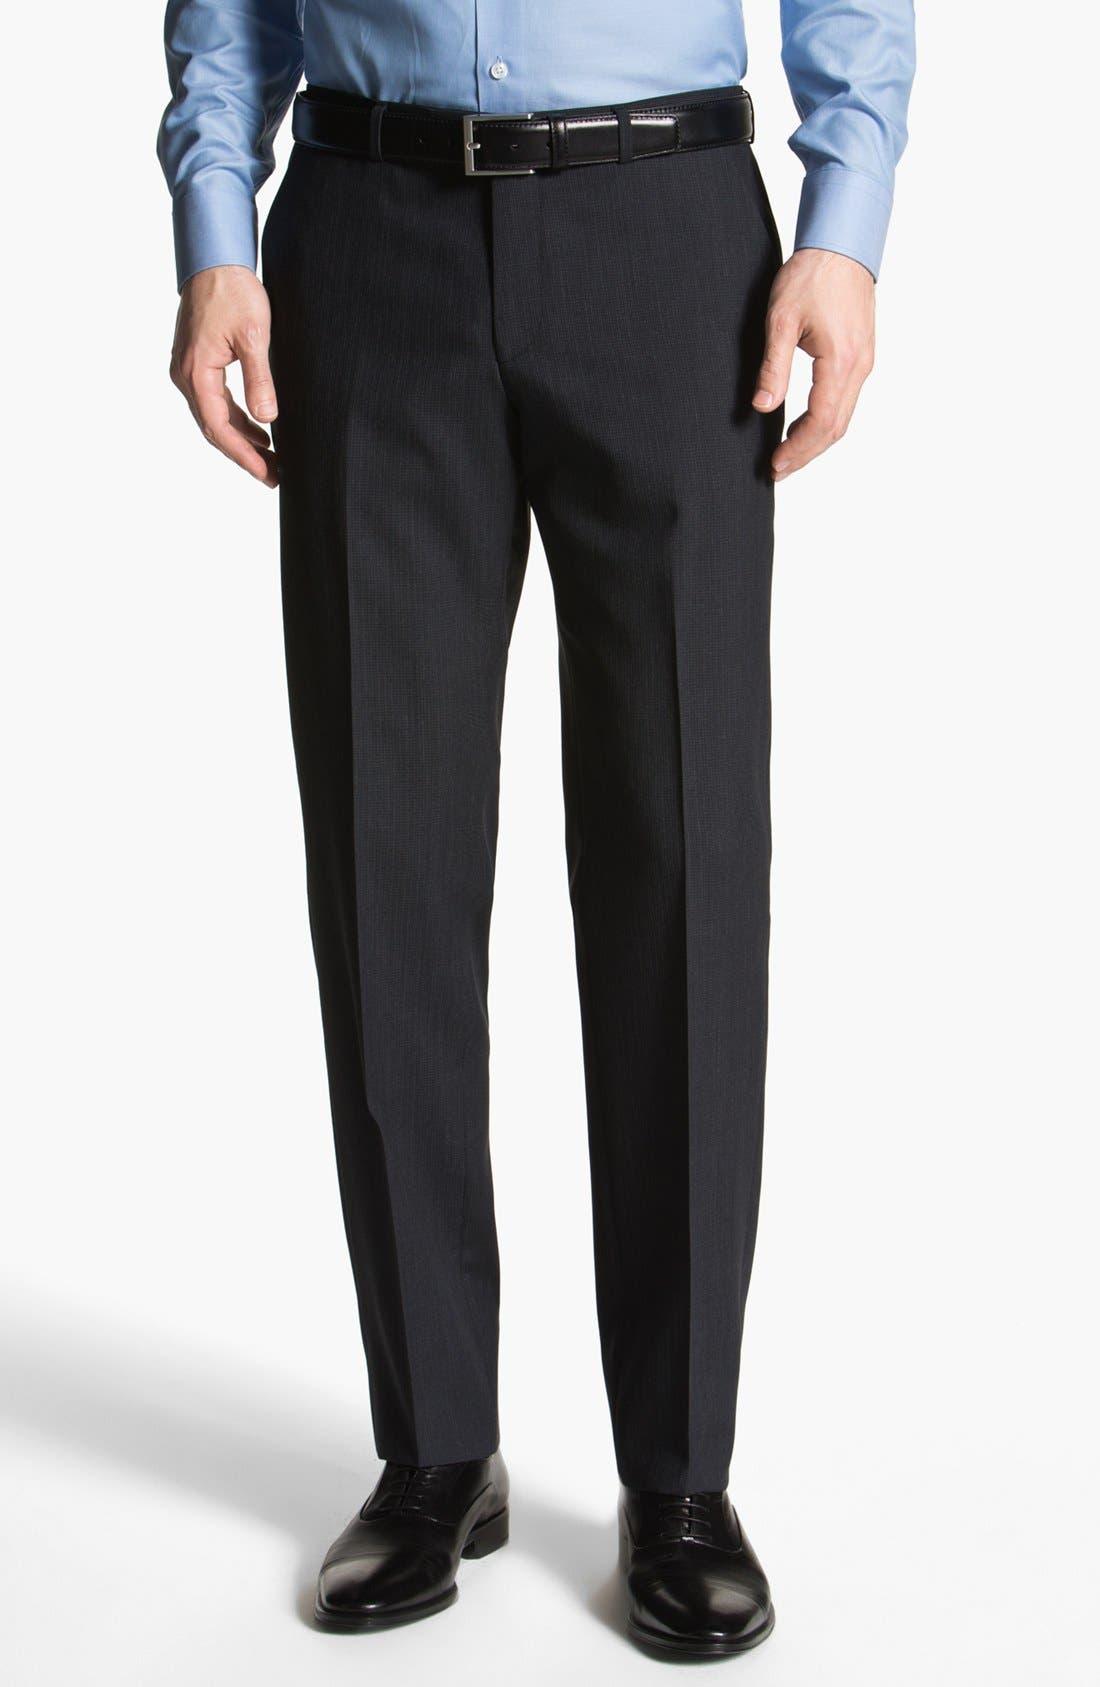 Alternate Image 1 Selected - BOSS HUGO BOSS 'Sharp' Flat Front Trousers